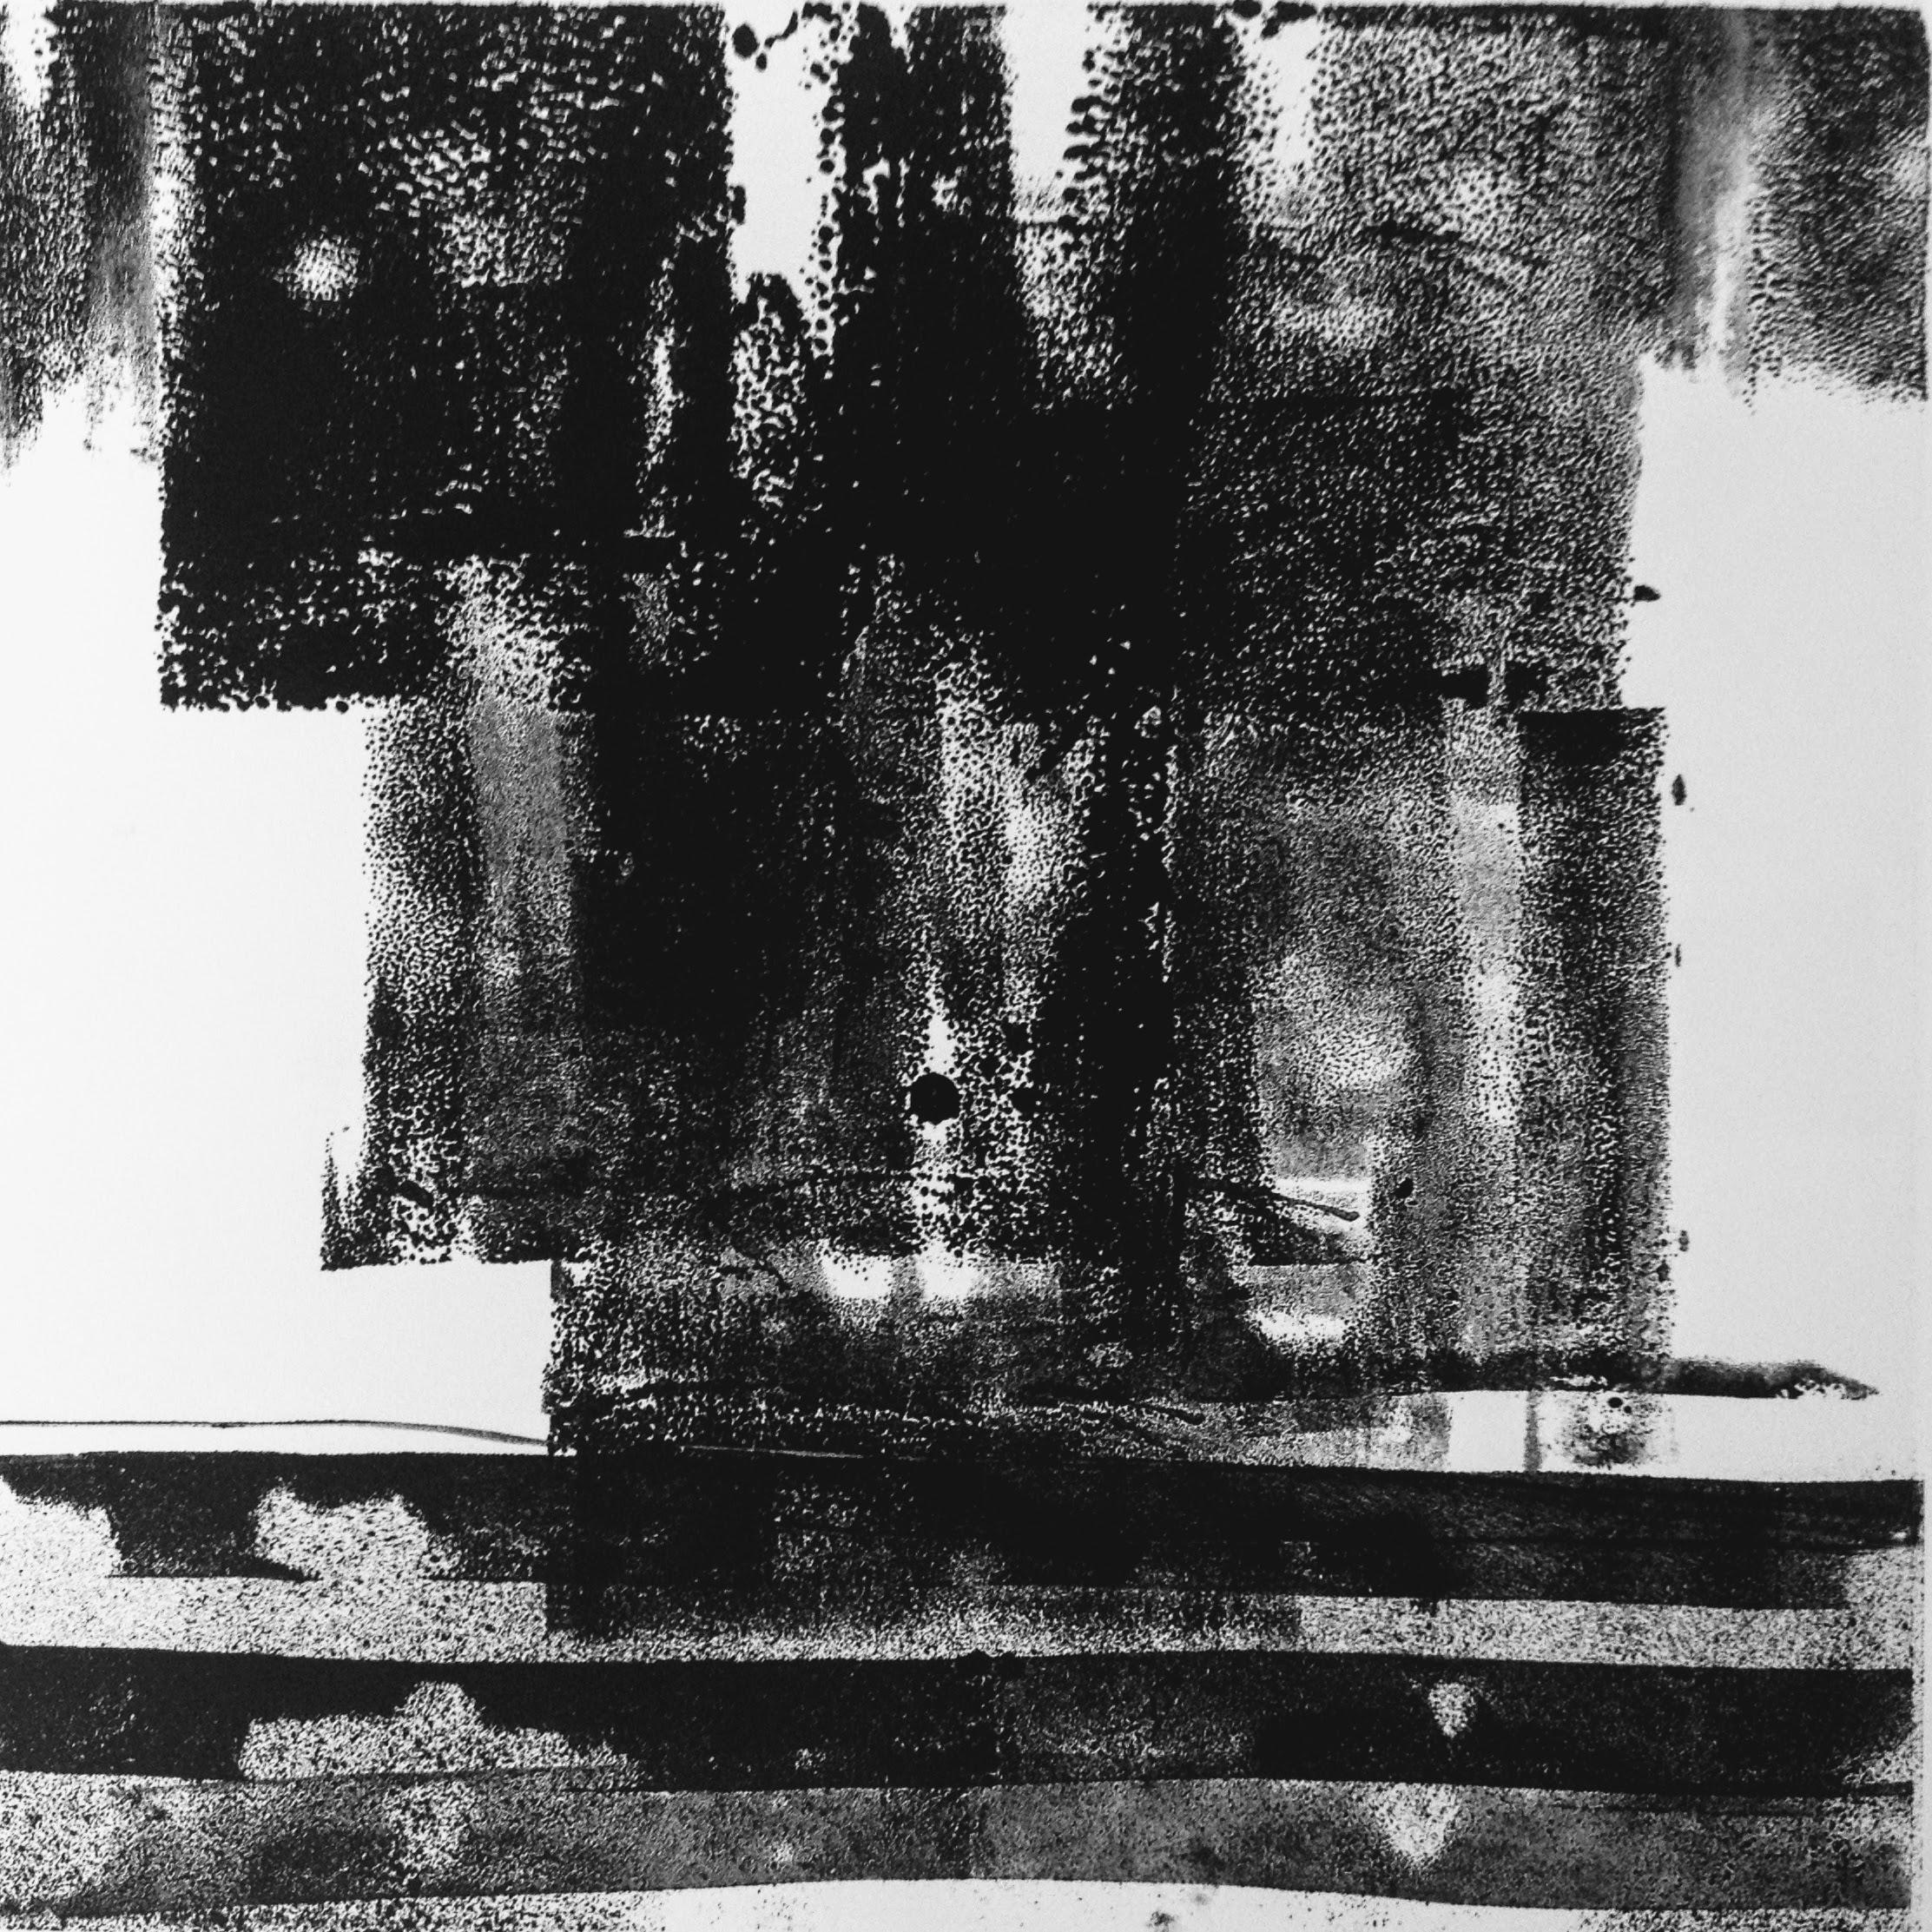 Dark Skies IV, monotype, 2017, 300x300mm, 250gm Somerset Satin